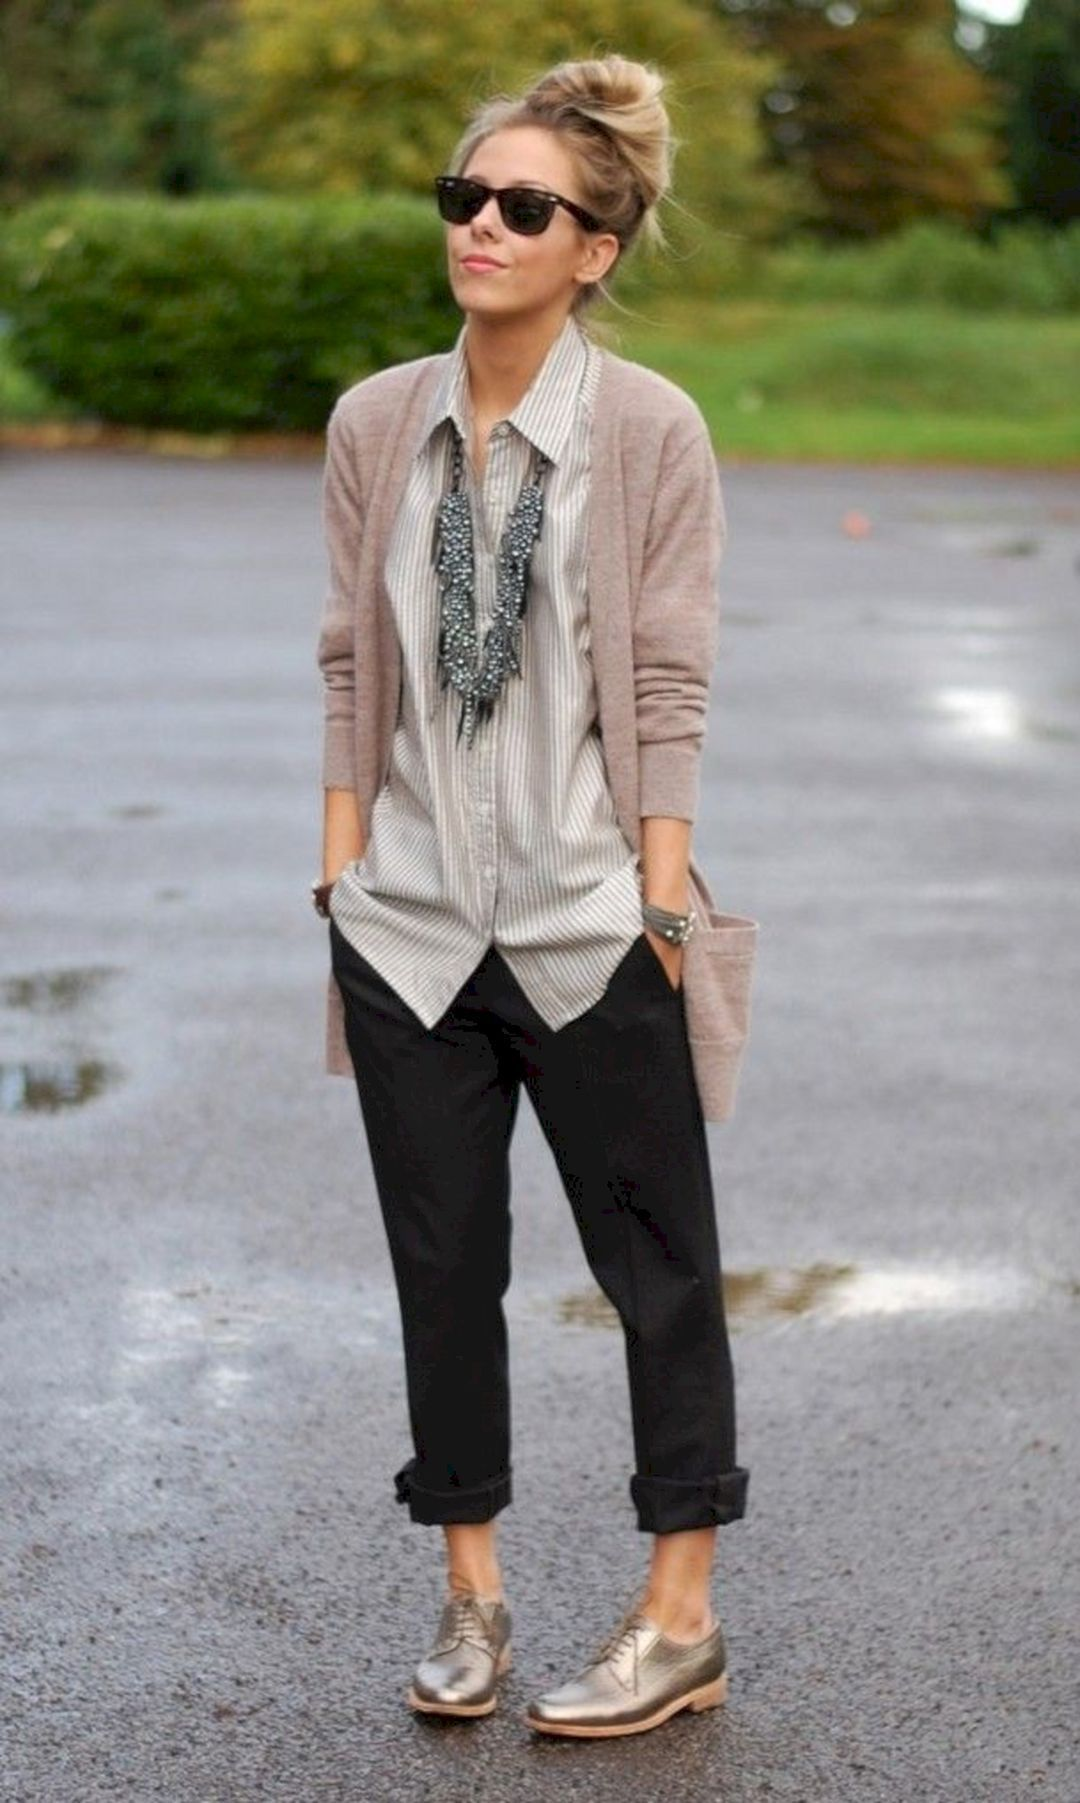 Women Oxford Shoes Outfits – Tuku OKE #oxfordwomens #oxfordshoesoutfit